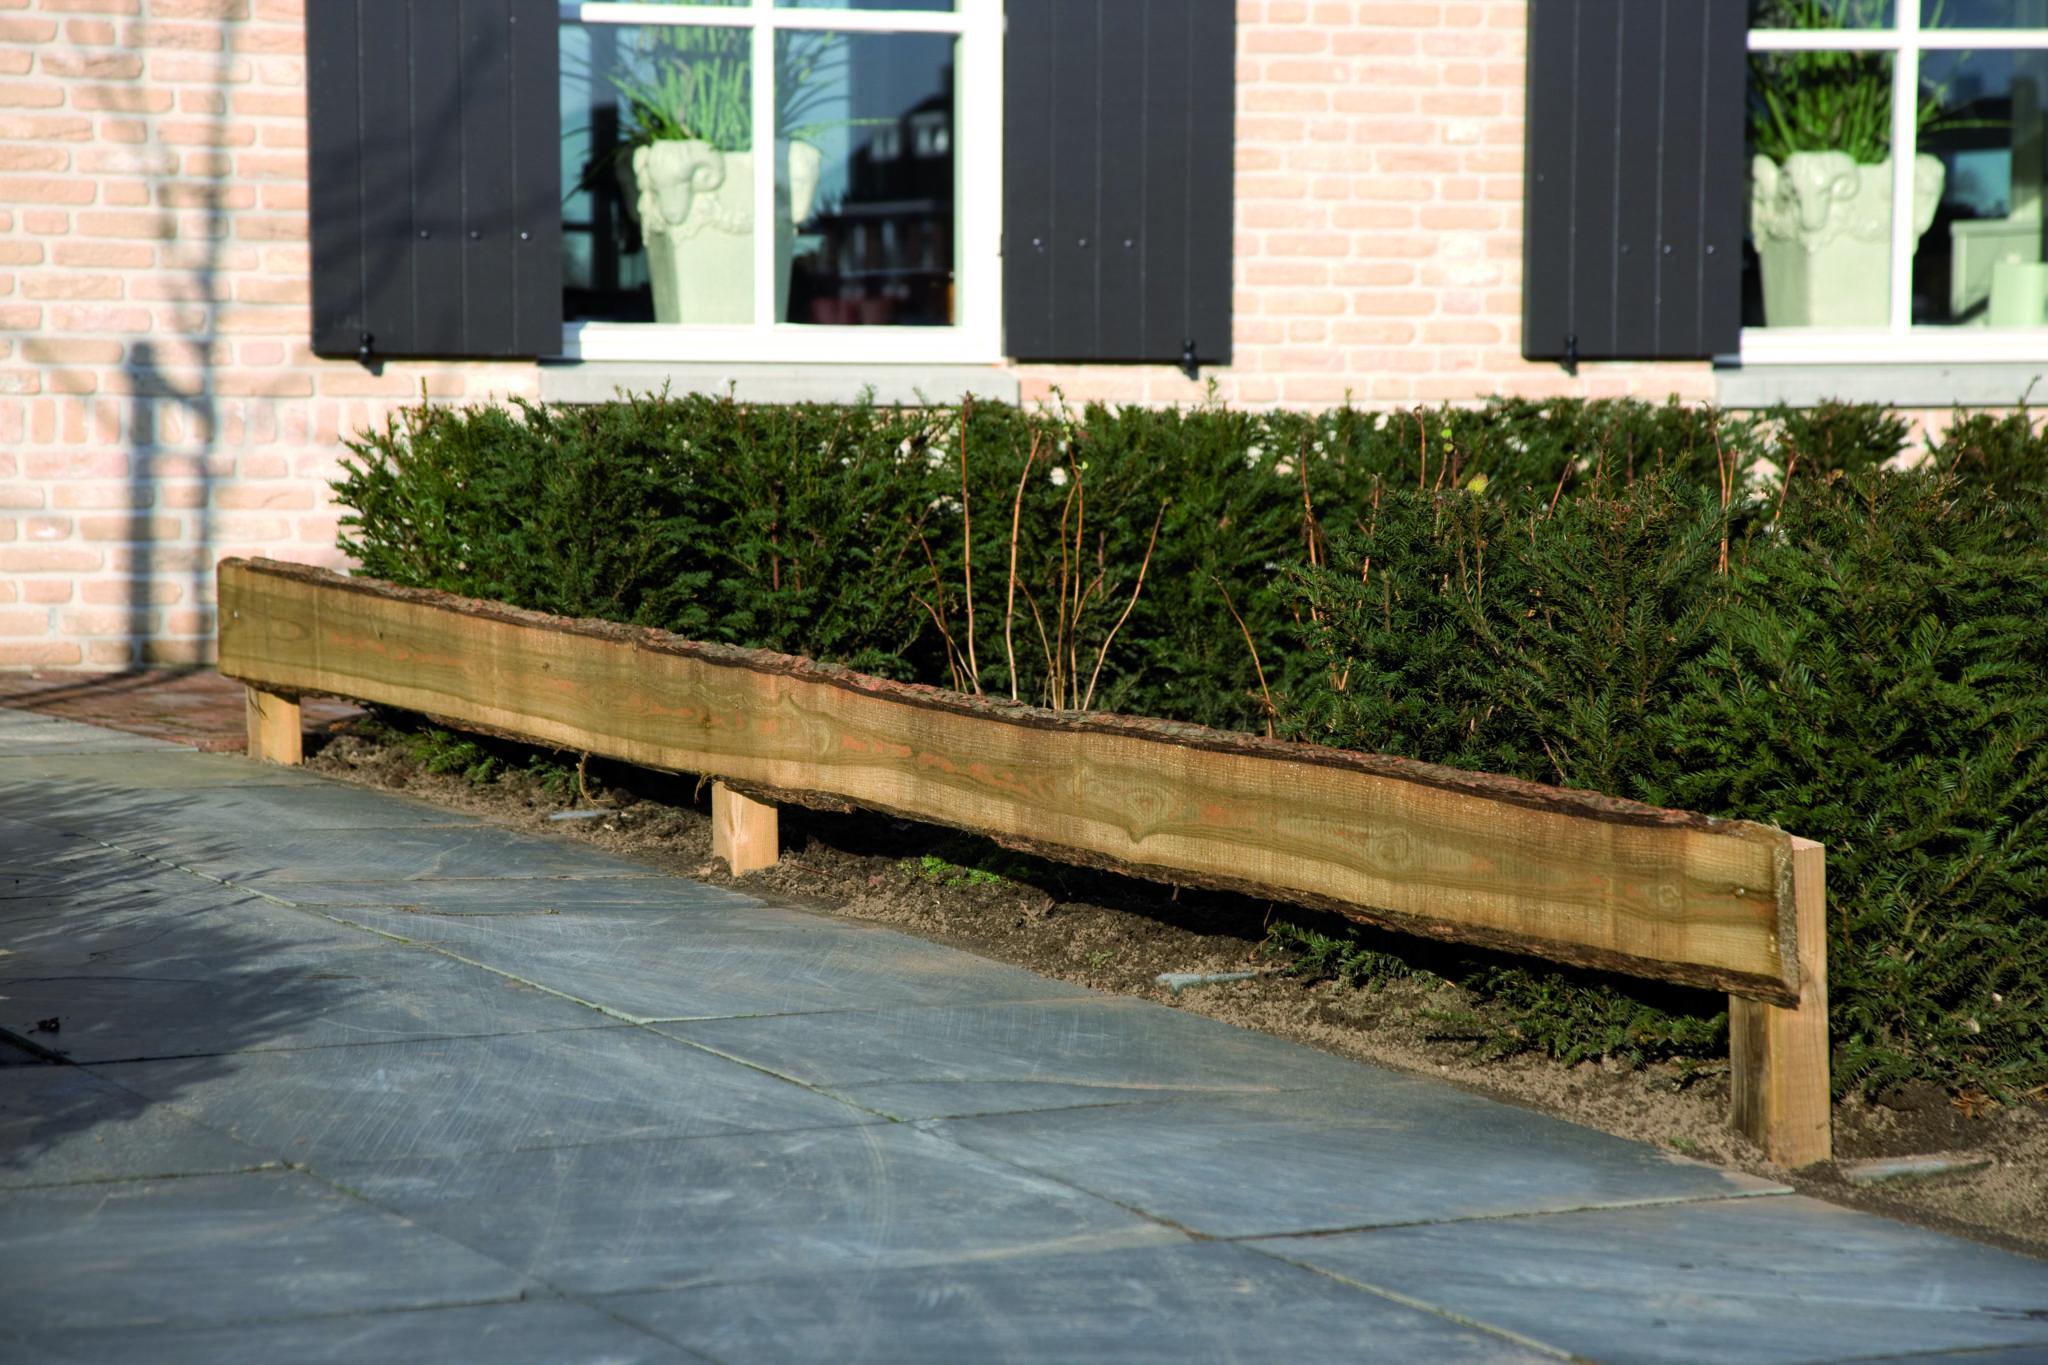 31001-31004-Basic-fijnbezaagde-schaaldelen-douglas-tuintimmerhout